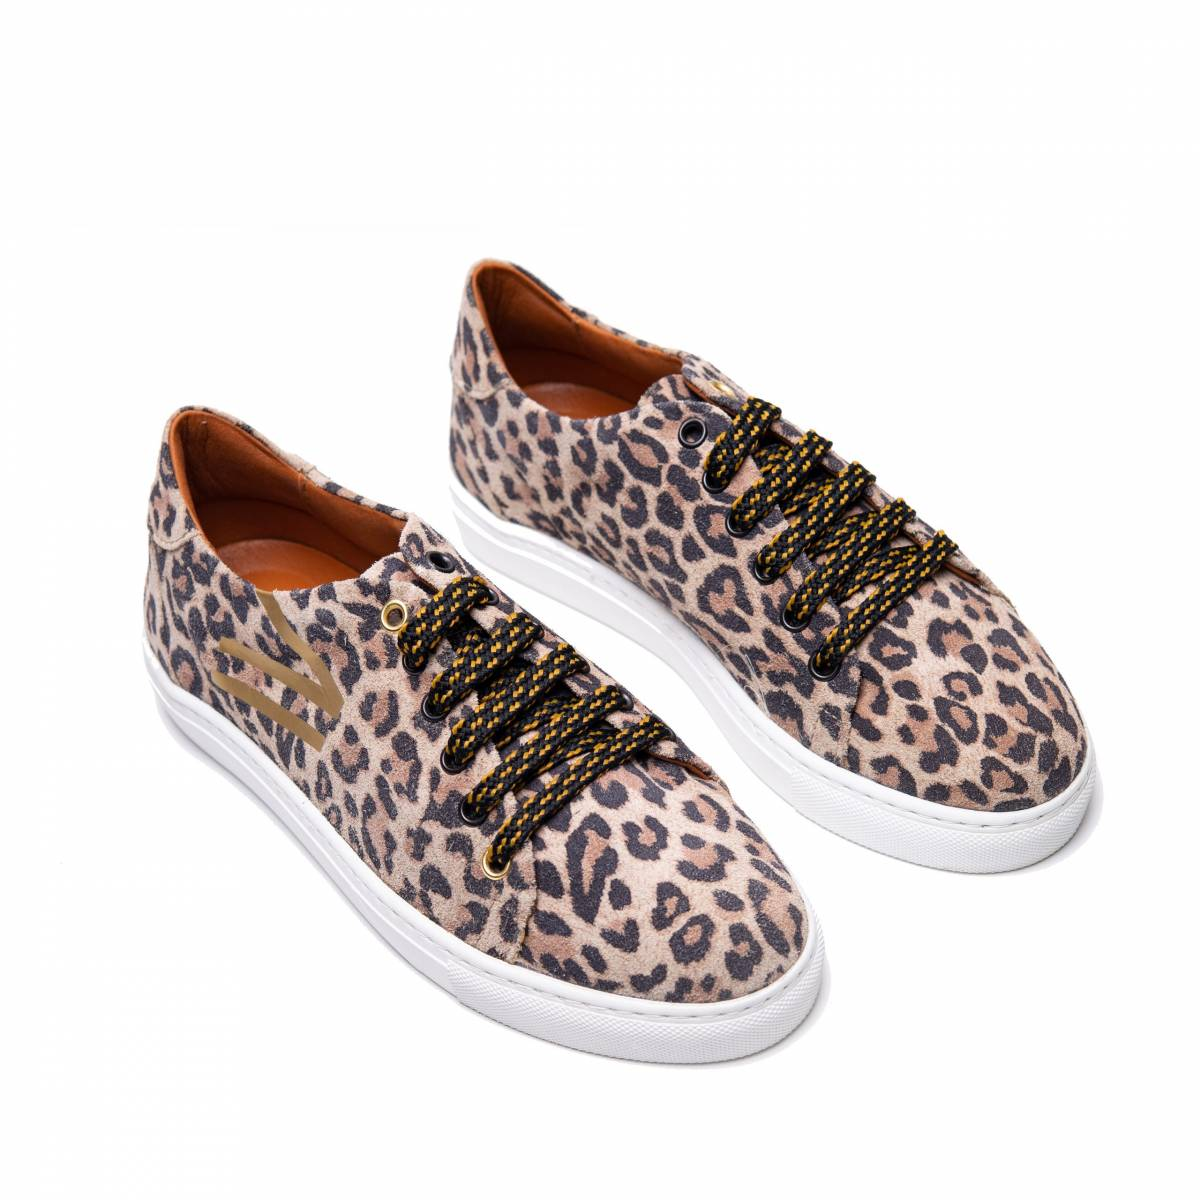 Doble-b-sneaker-leopardo-lr.jpg